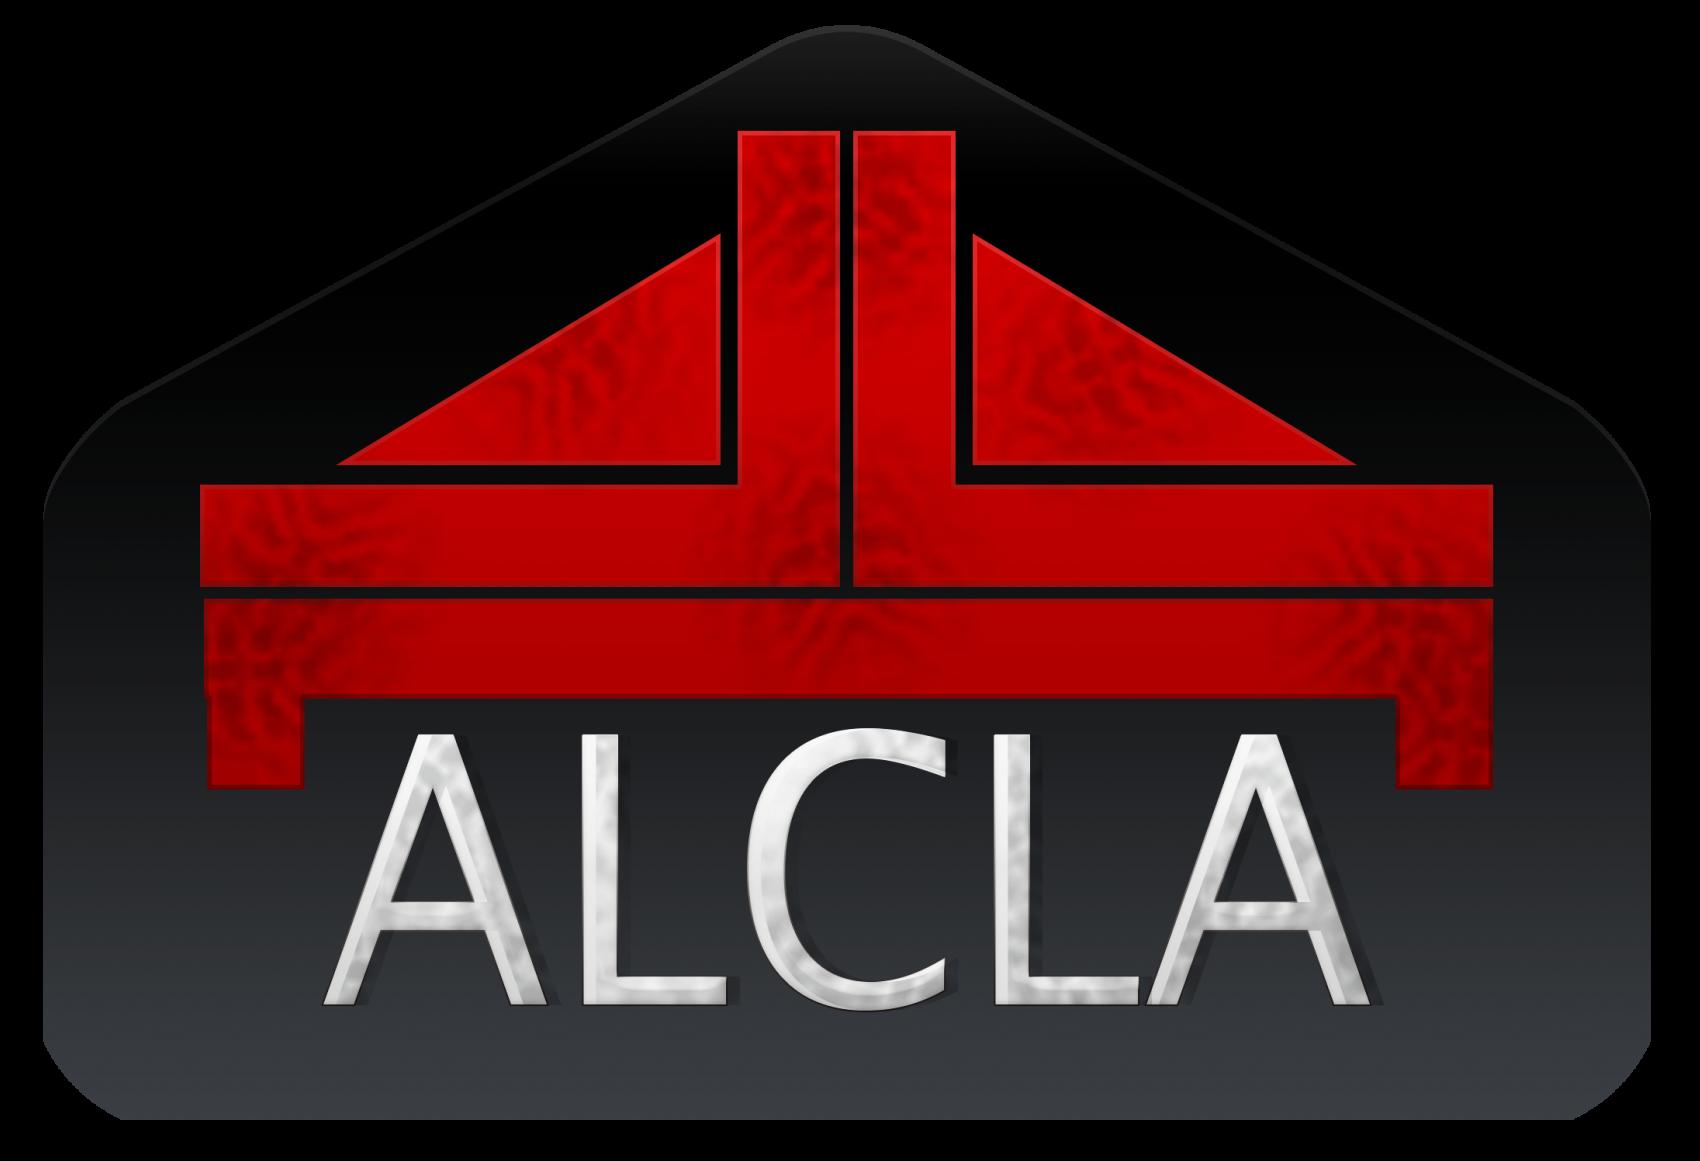 ALCLA